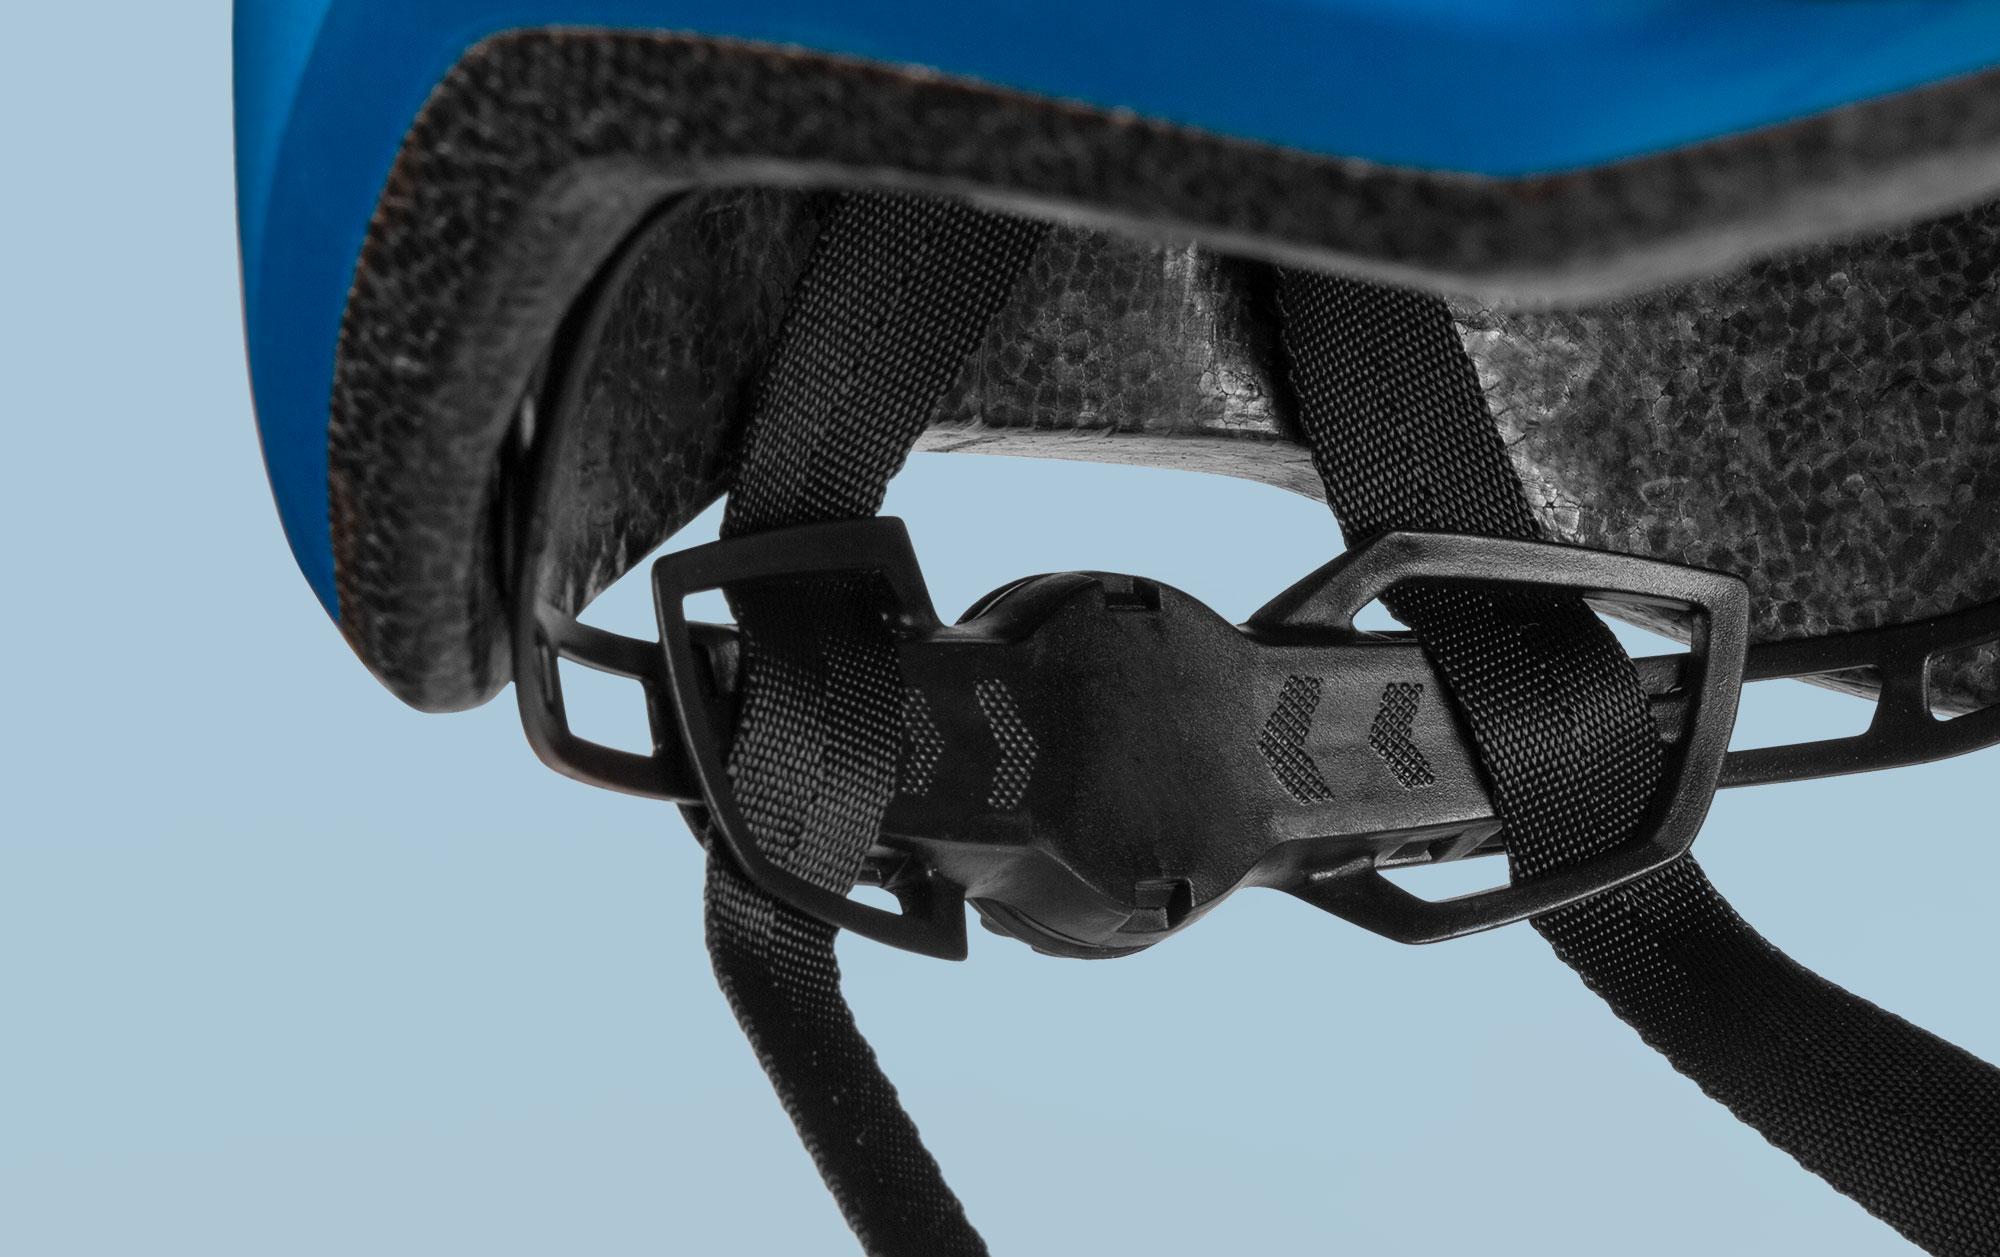 MET Downtown Trekking and City Helmet Retention System